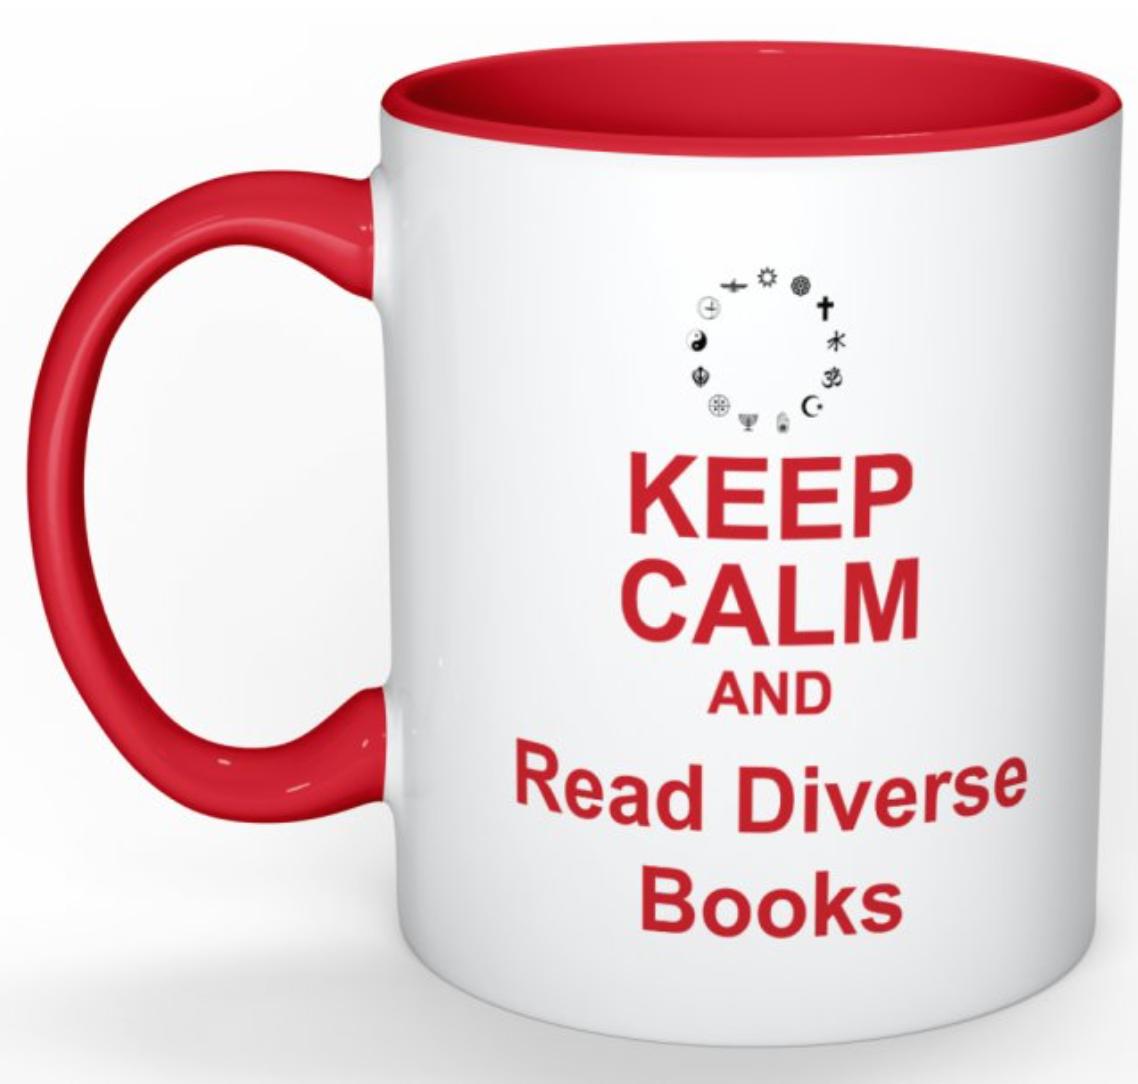 Keep Calm Diversity Read Books Mug Red